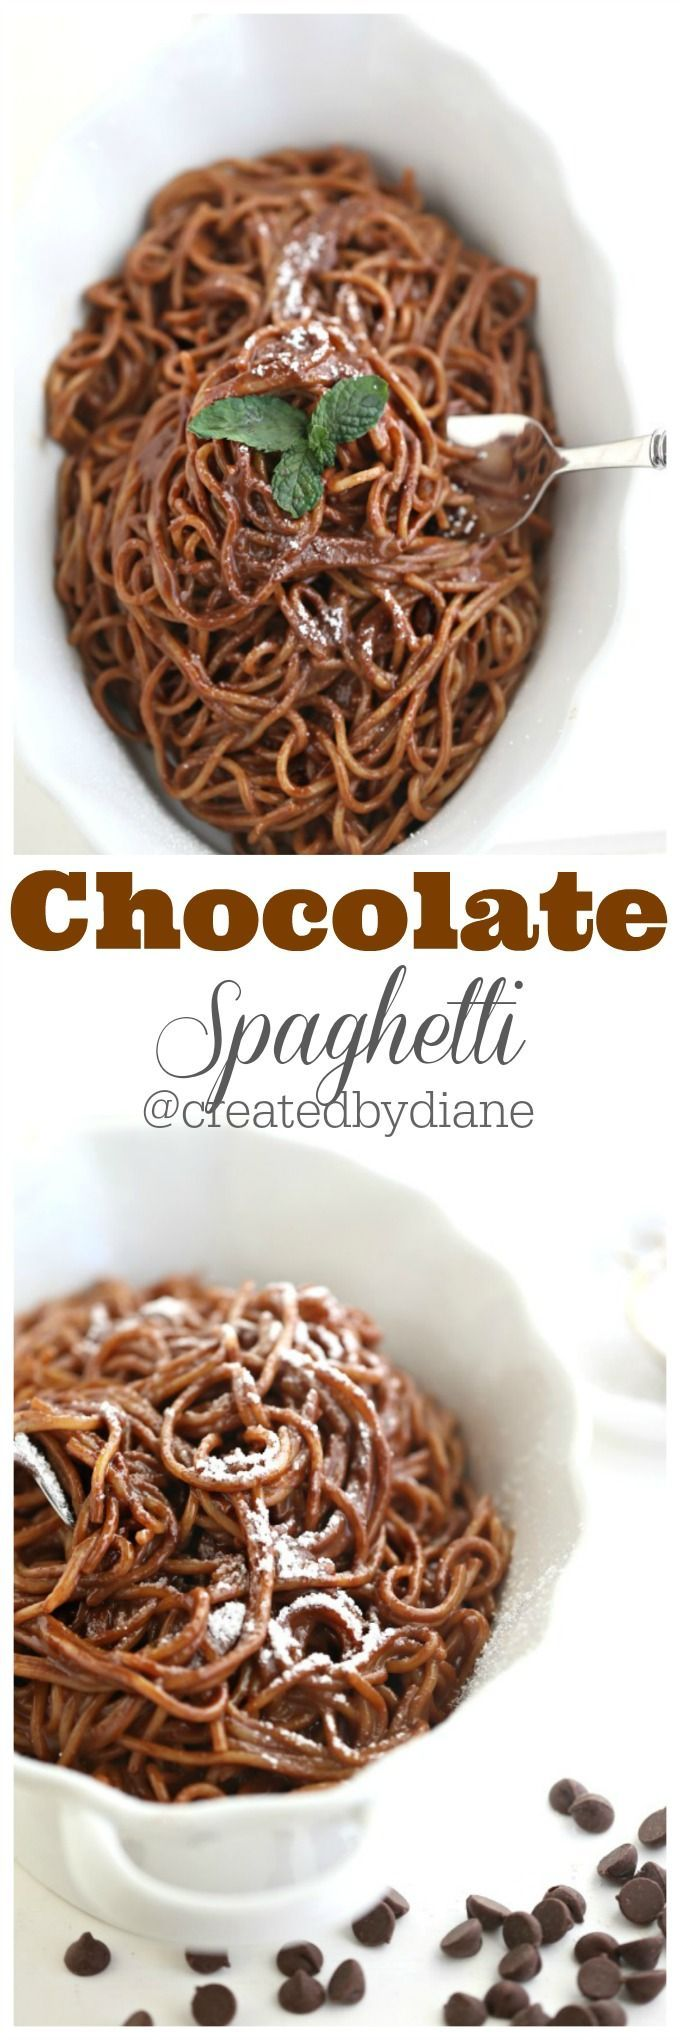 Chocolate Spaghetti Recipe perfect comfort food @createdbydiane #NewTraditions #Ad